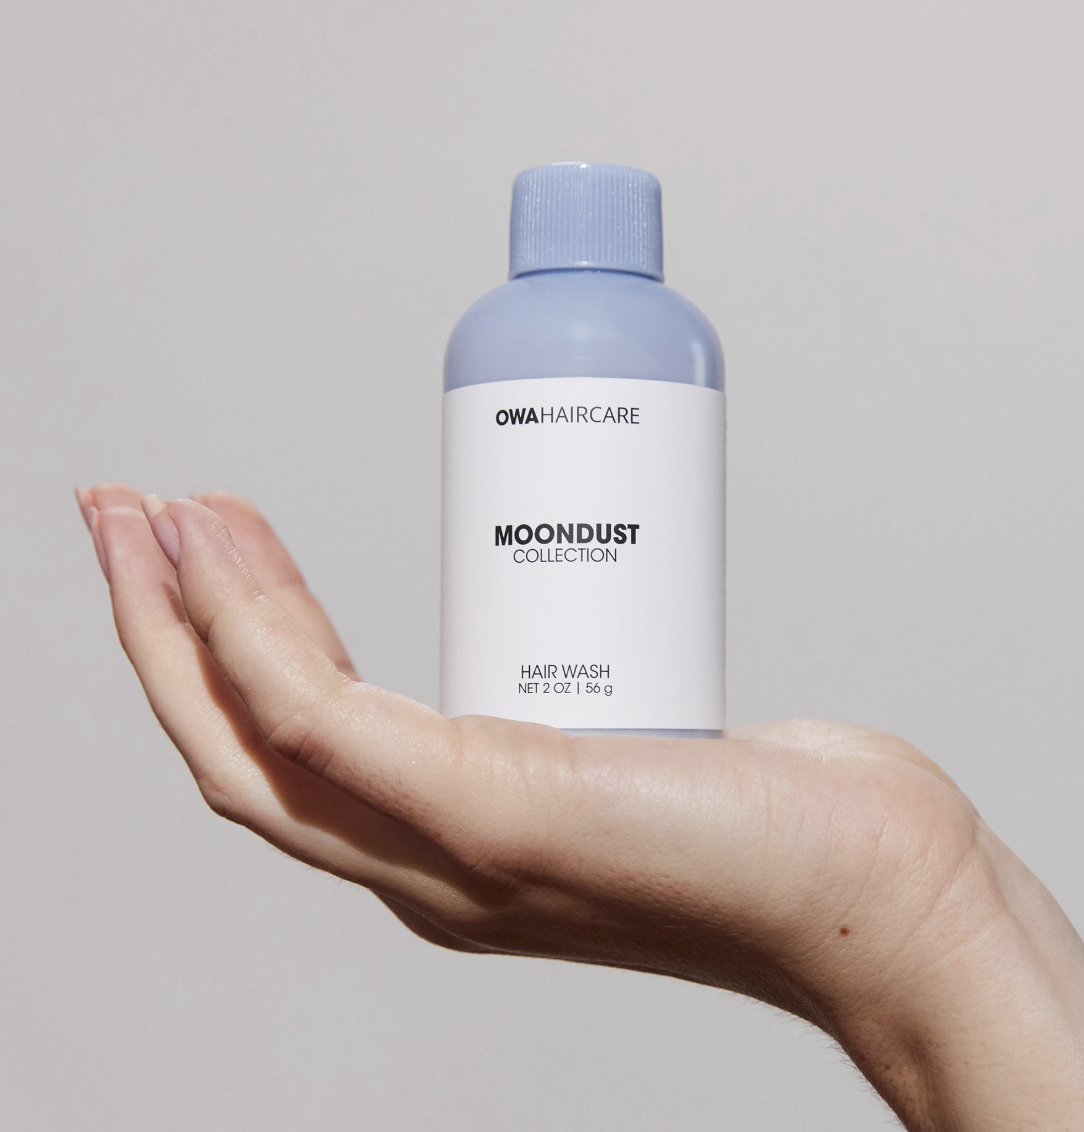 a model's hand holding the bottle of Moondust